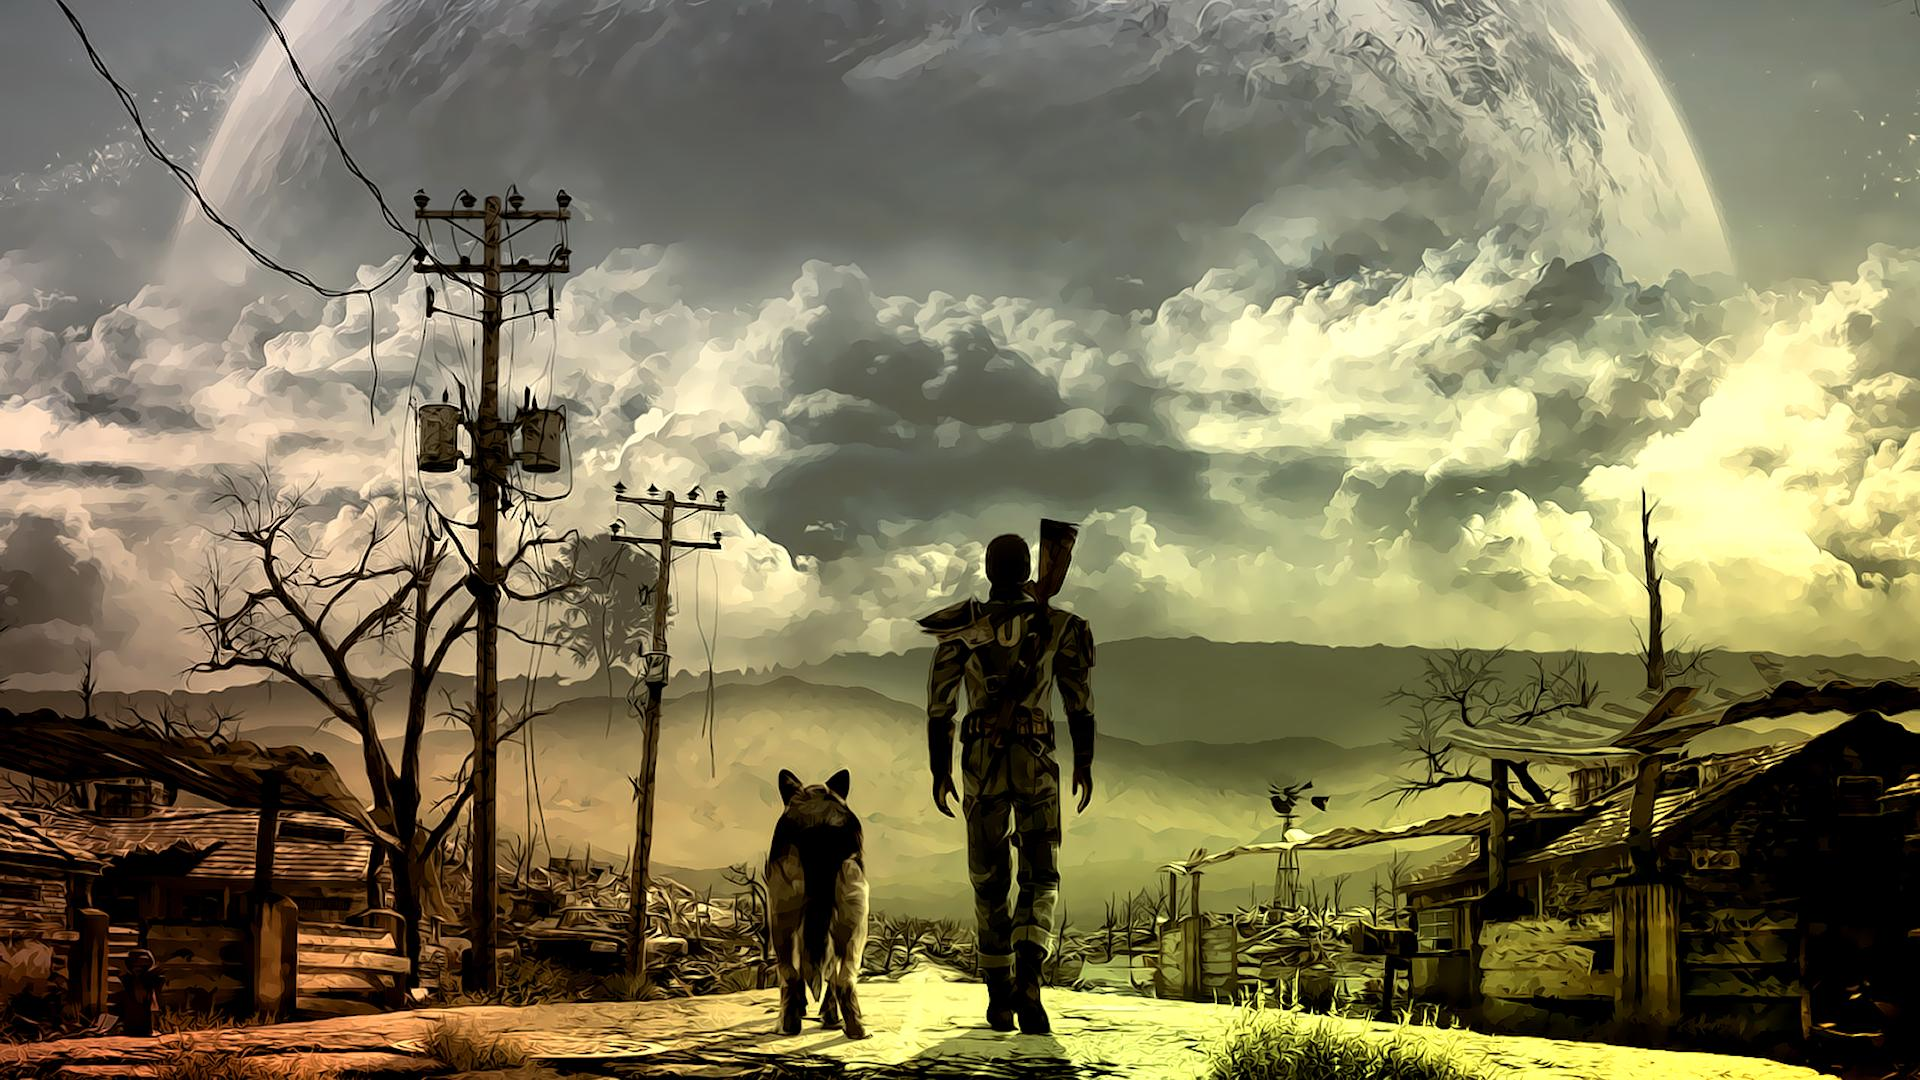 『Fallout 4』、発売初日の出荷本数は約1200万本